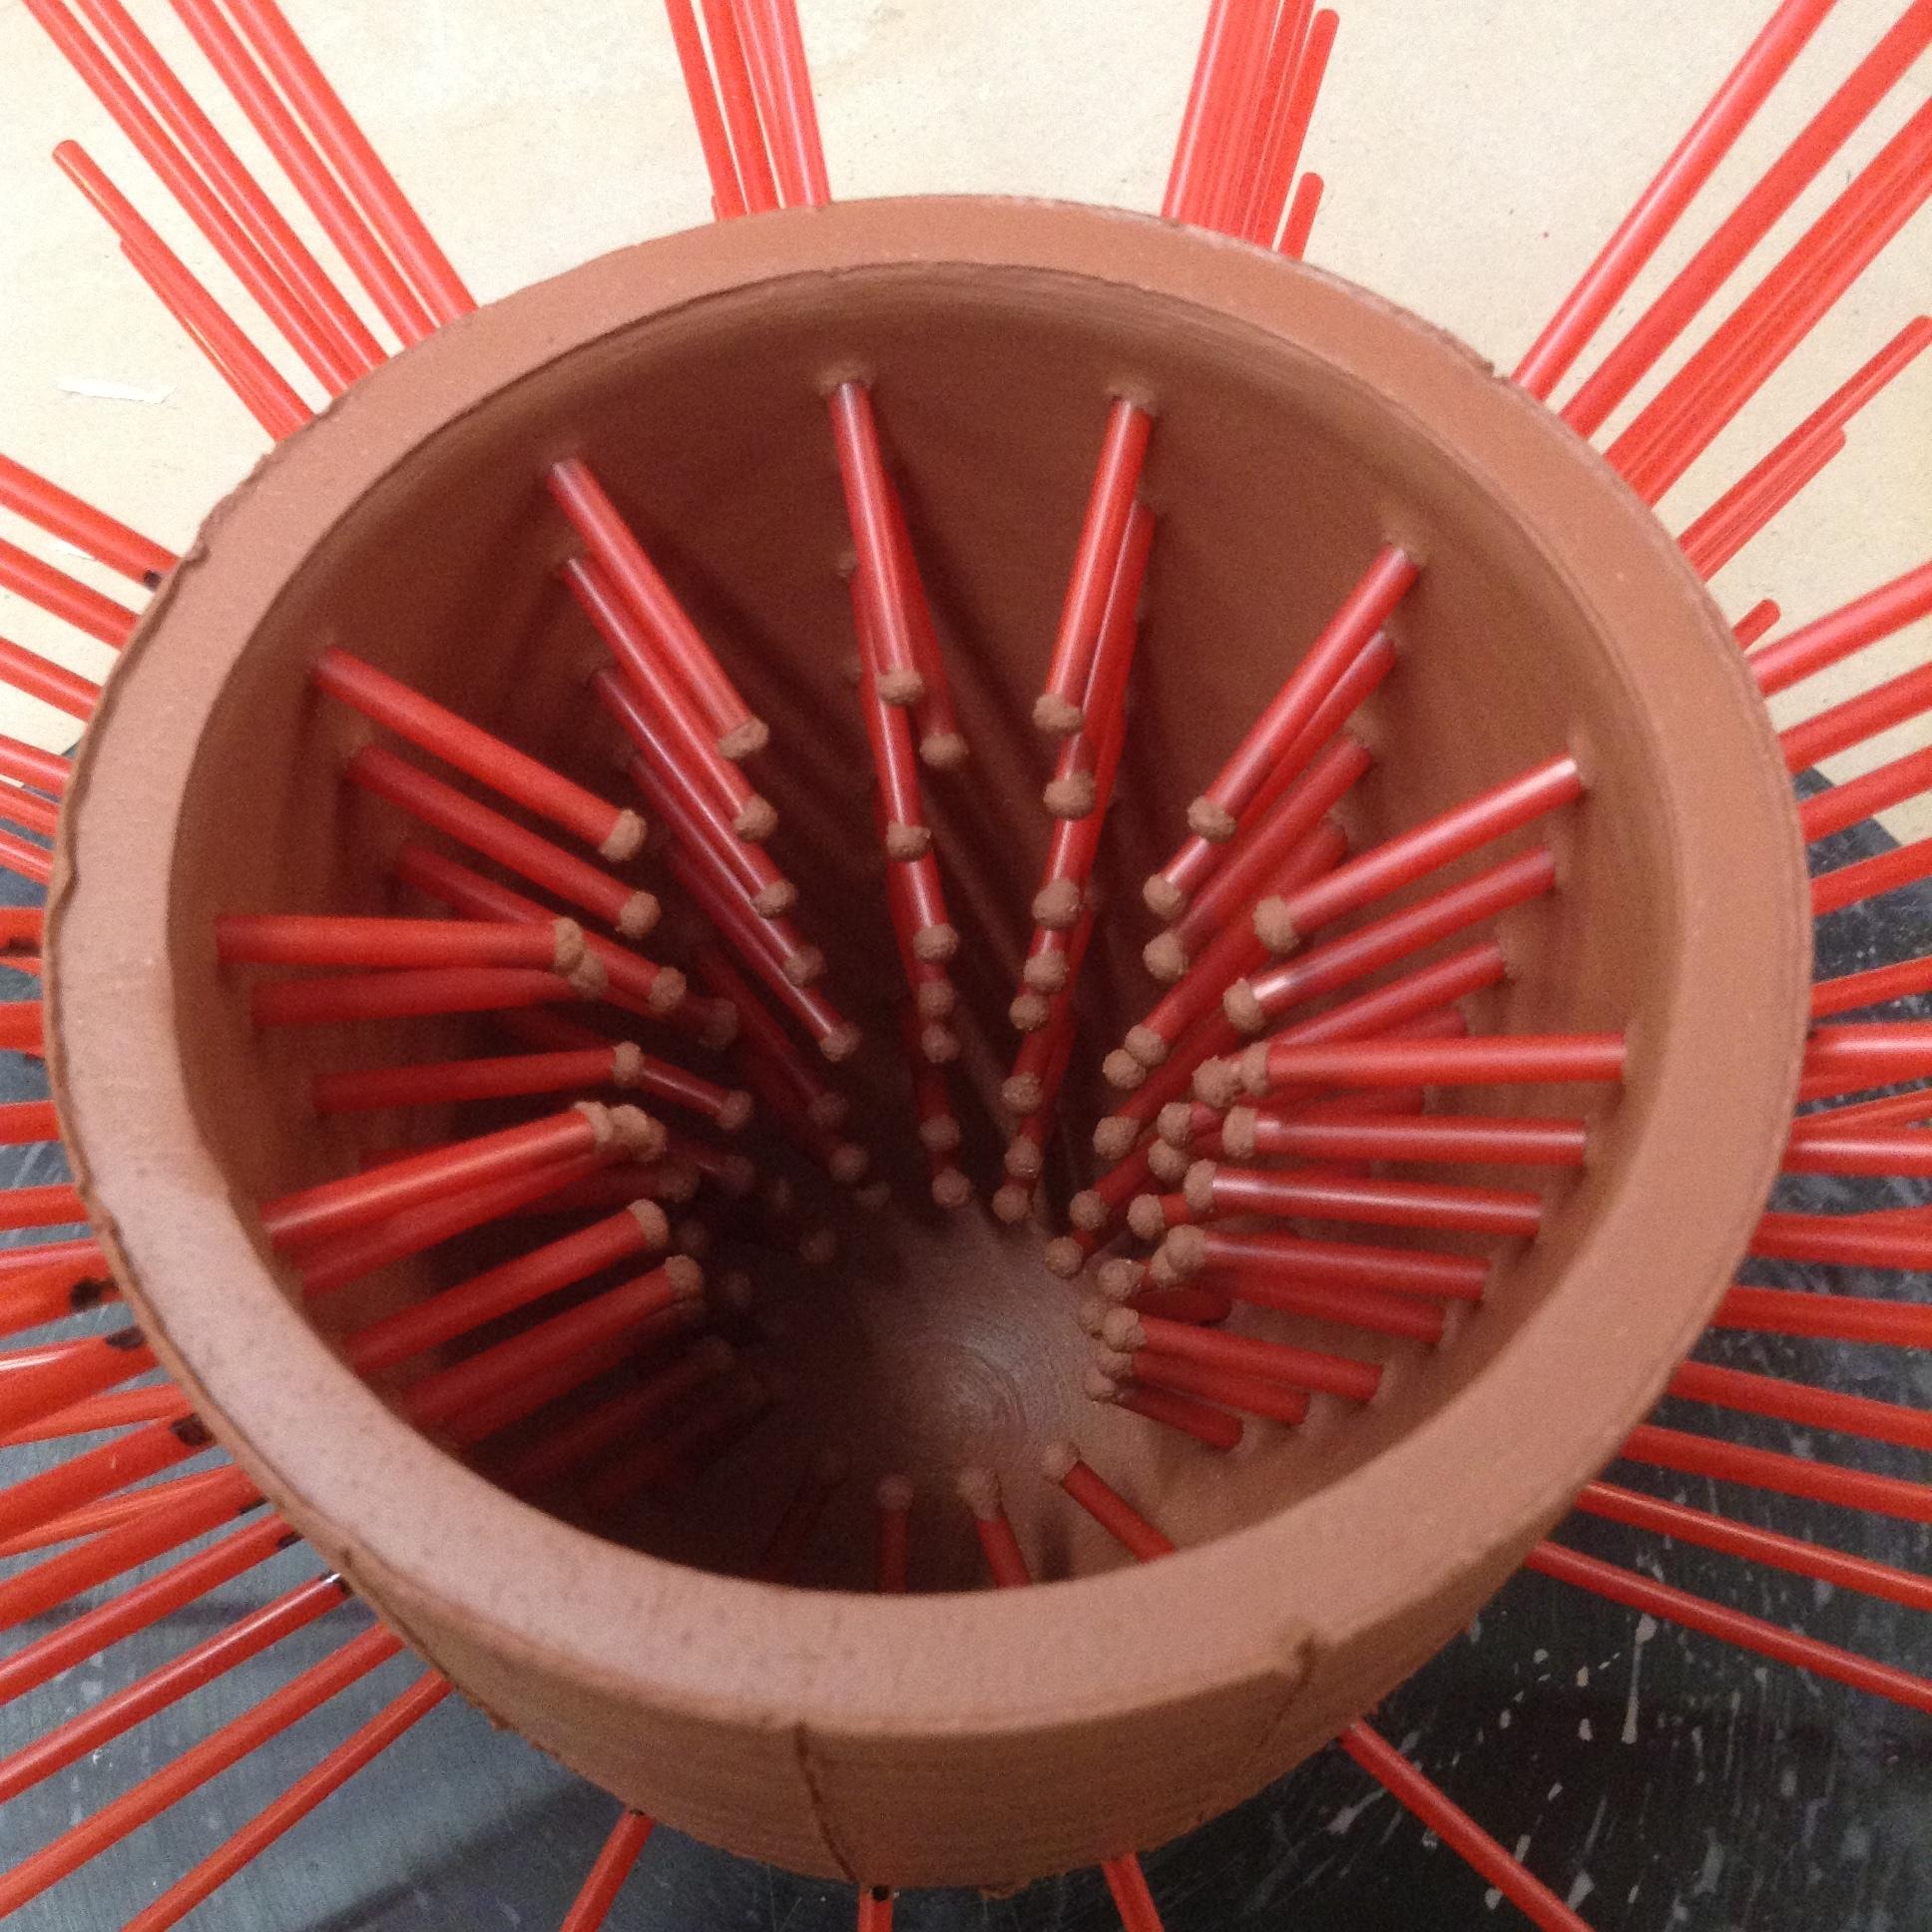 cone straw install process3.JPG